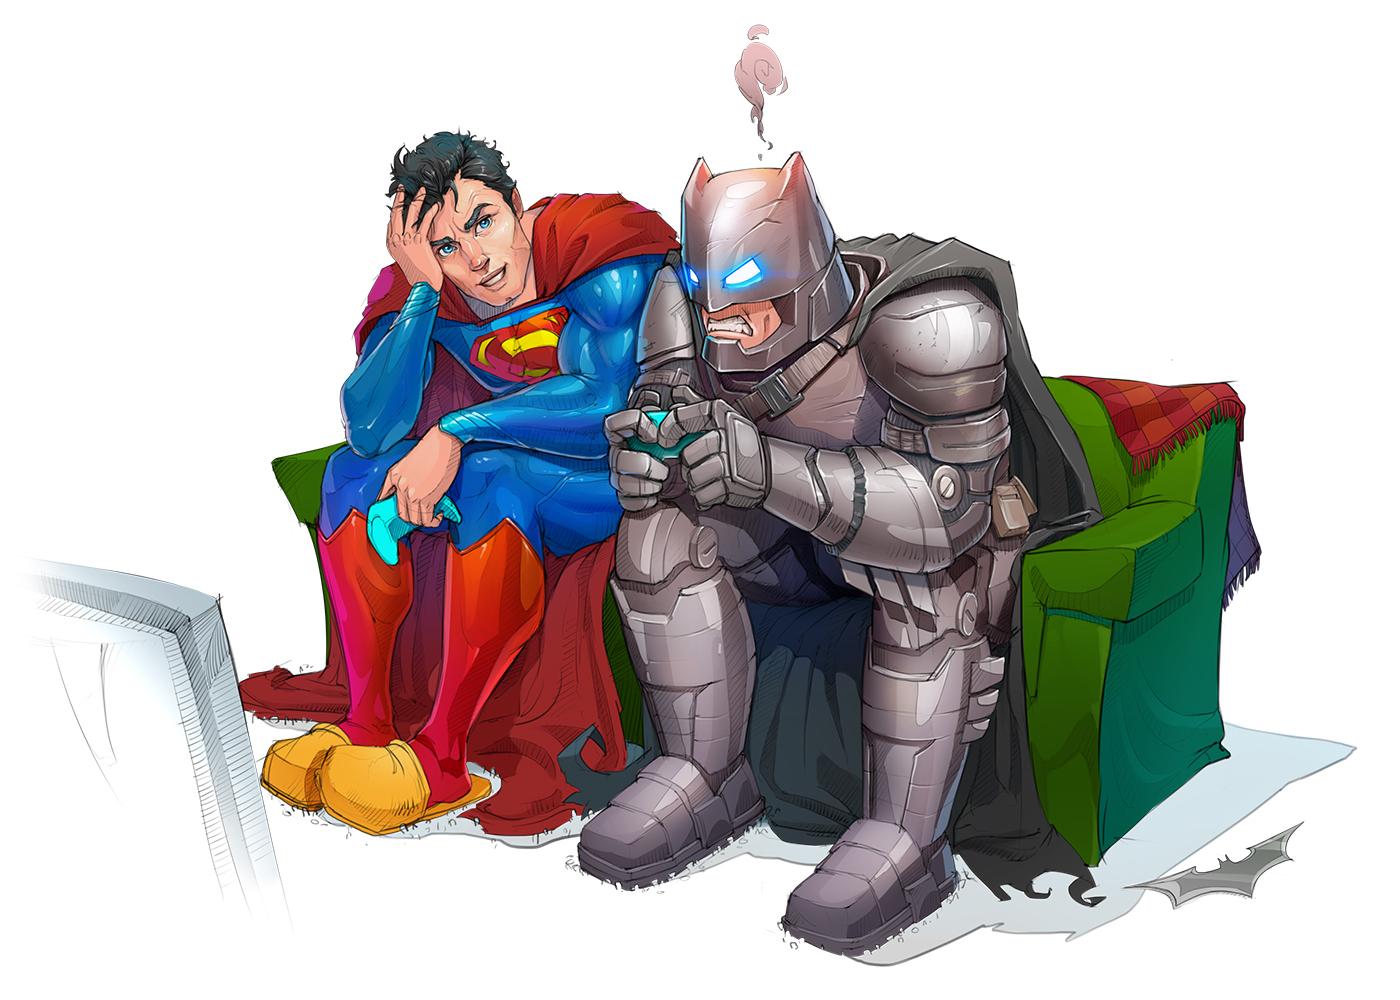 batman superman Justice battle fighting controller game Character dc comic